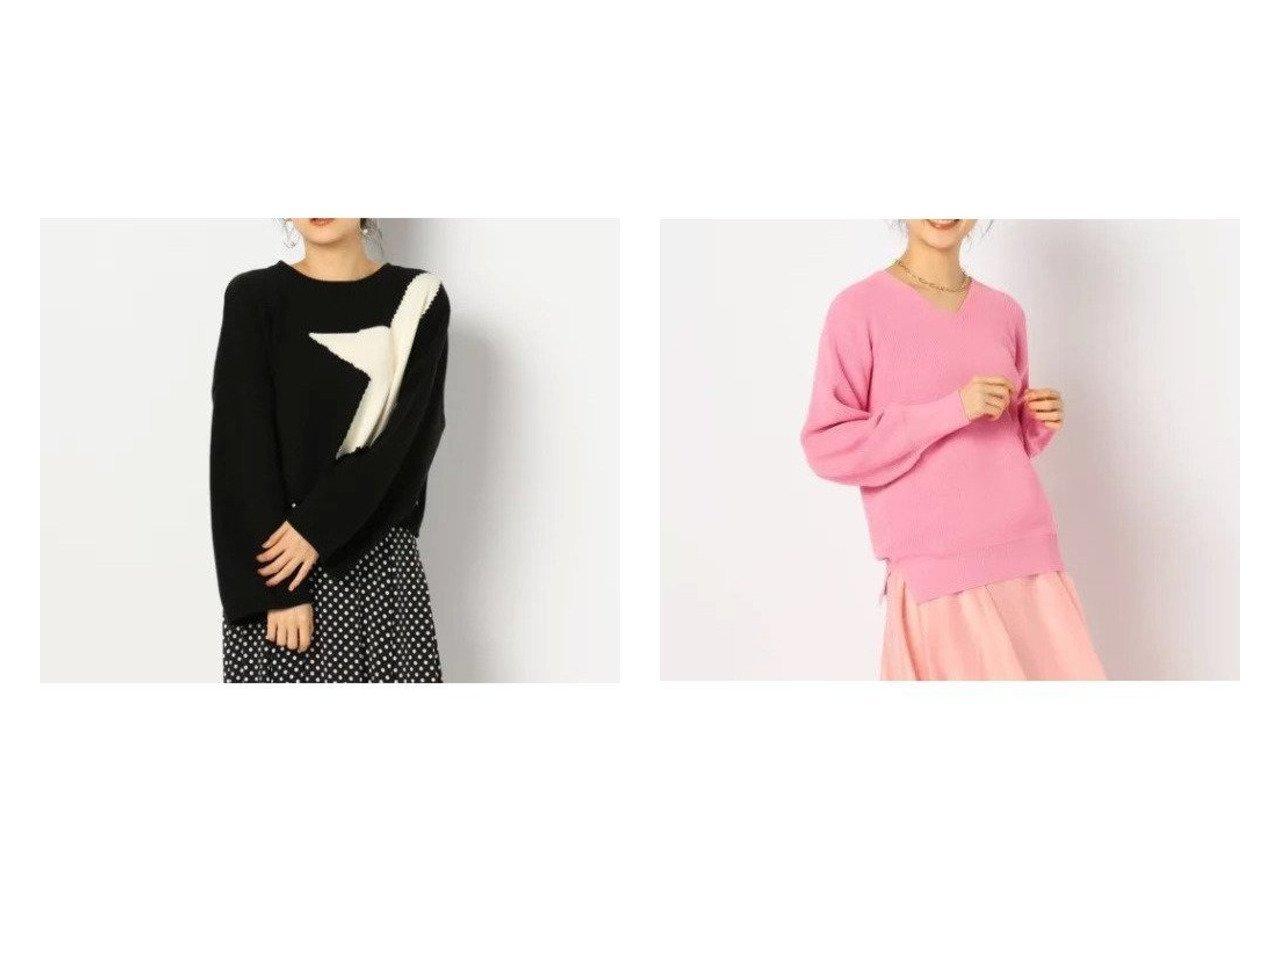 【Rie Miller/リエミラー】の星インターシャプルオーバーニット&【NOLLEY'S/ノーリーズ】の片畦Vネックプルオーバーニット トップス・カットソーのおすすめ!人気、トレンド・レディースファッションの通販 おすすめで人気の流行・トレンド、ファッションの通販商品 メンズファッション・キッズファッション・インテリア・家具・レディースファッション・服の通販 founy(ファニー) https://founy.com/ ファッション Fashion レディースファッション WOMEN トップス Tops Tshirt ニット Knit Tops プルオーバー Pullover Vネック V-Neck ショルダー スタイリッシュ セーター ドロップ モチーフ ロング 春 畦  ID:crp329100000009290